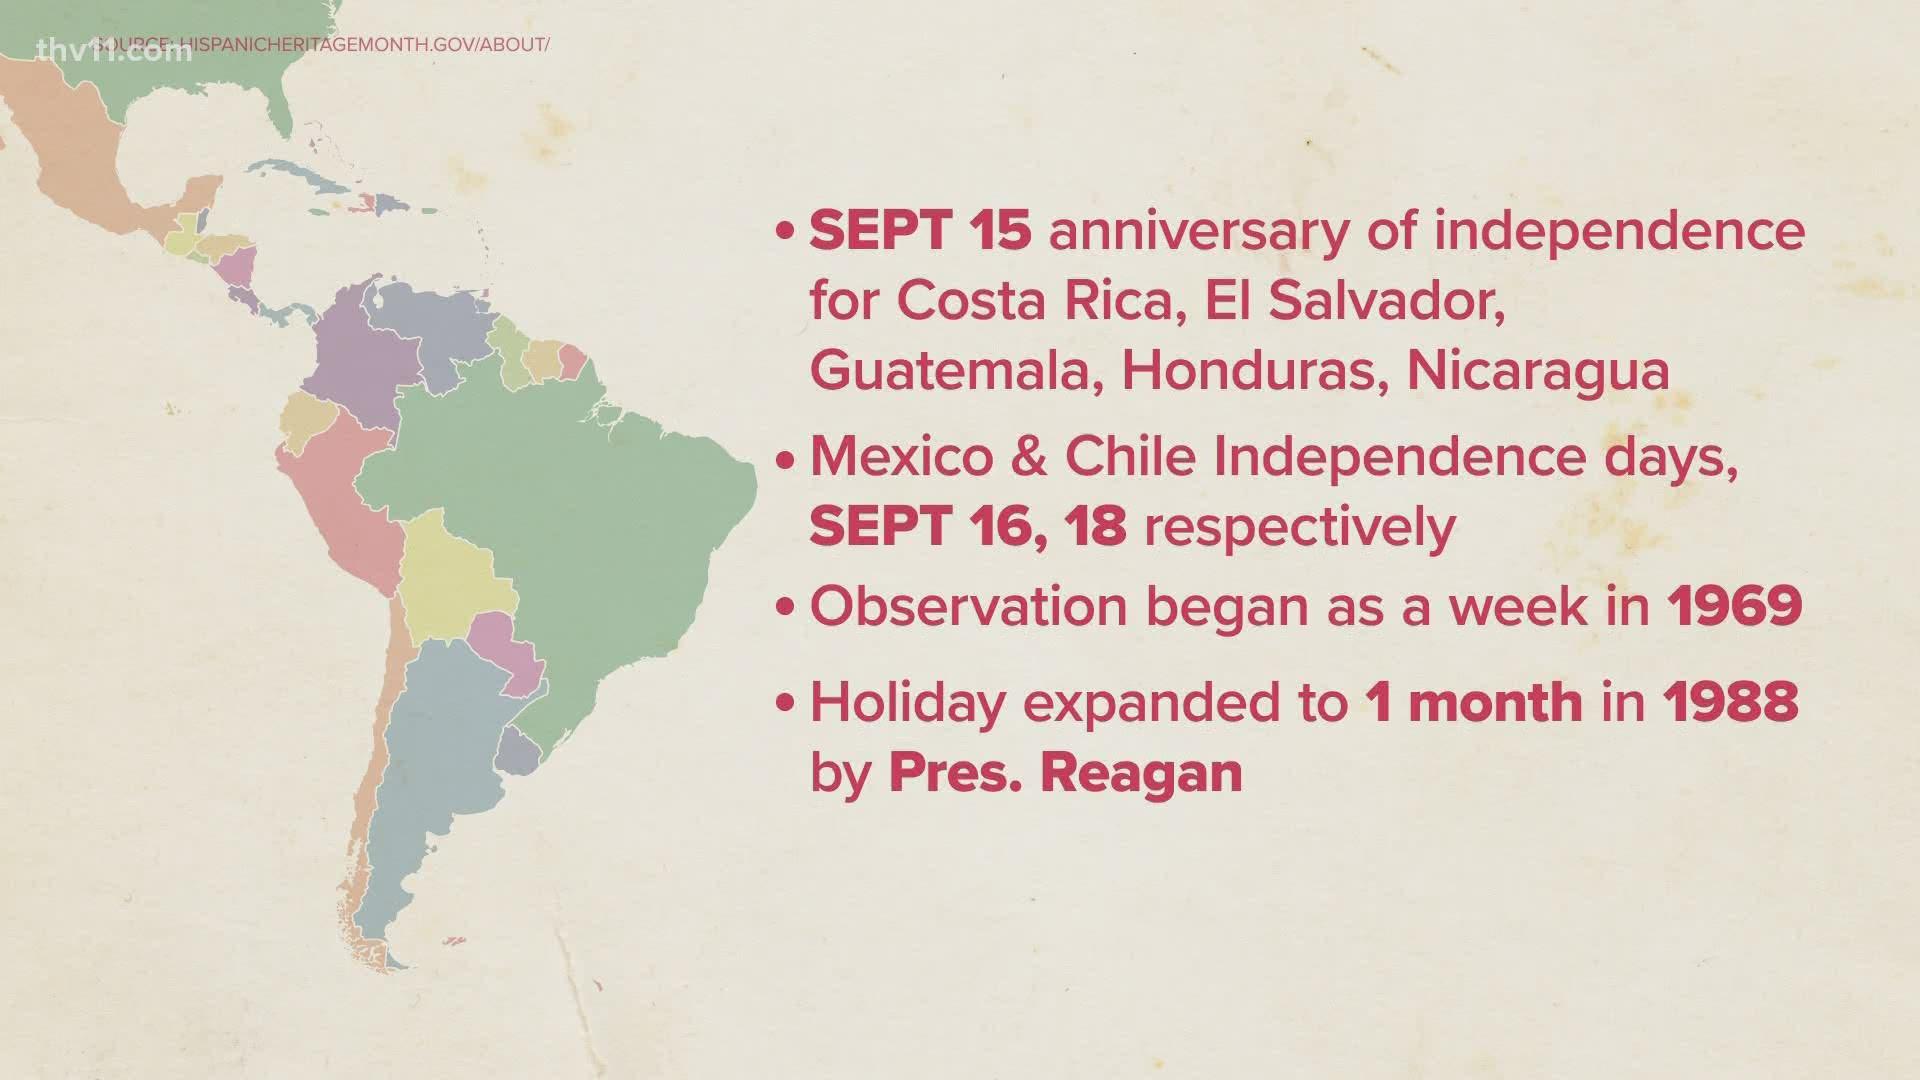 National Hispanic Heritage Month Kicks Off Sept 15